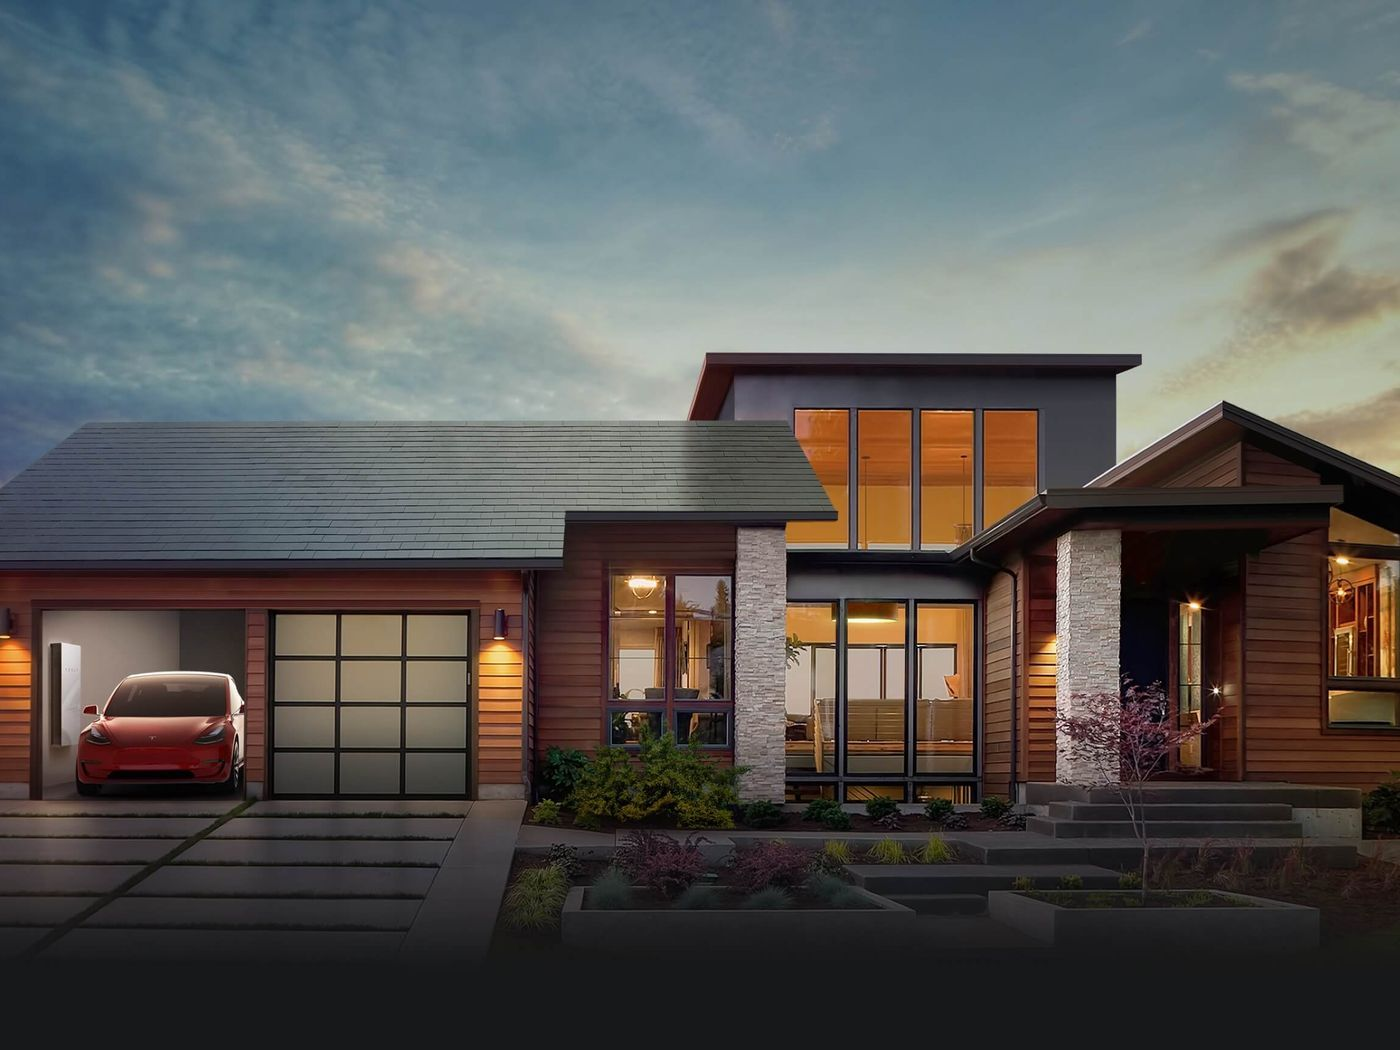 Tesla S New Rooftop Solar Panels Don T Look Like Solar Panels With Images Tesla Solar Roof Solar Roof Shingles Solar Tiles